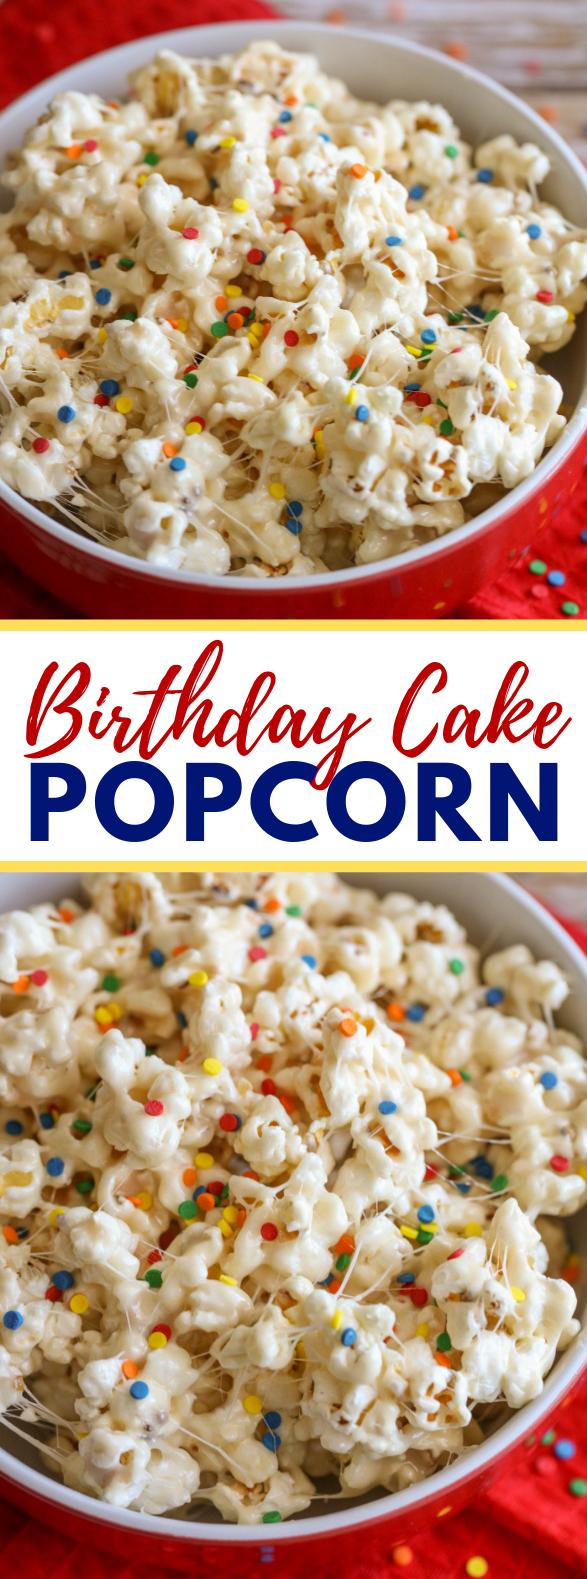 BIRTHDAY CAKE POPCORN #dessert #cakes